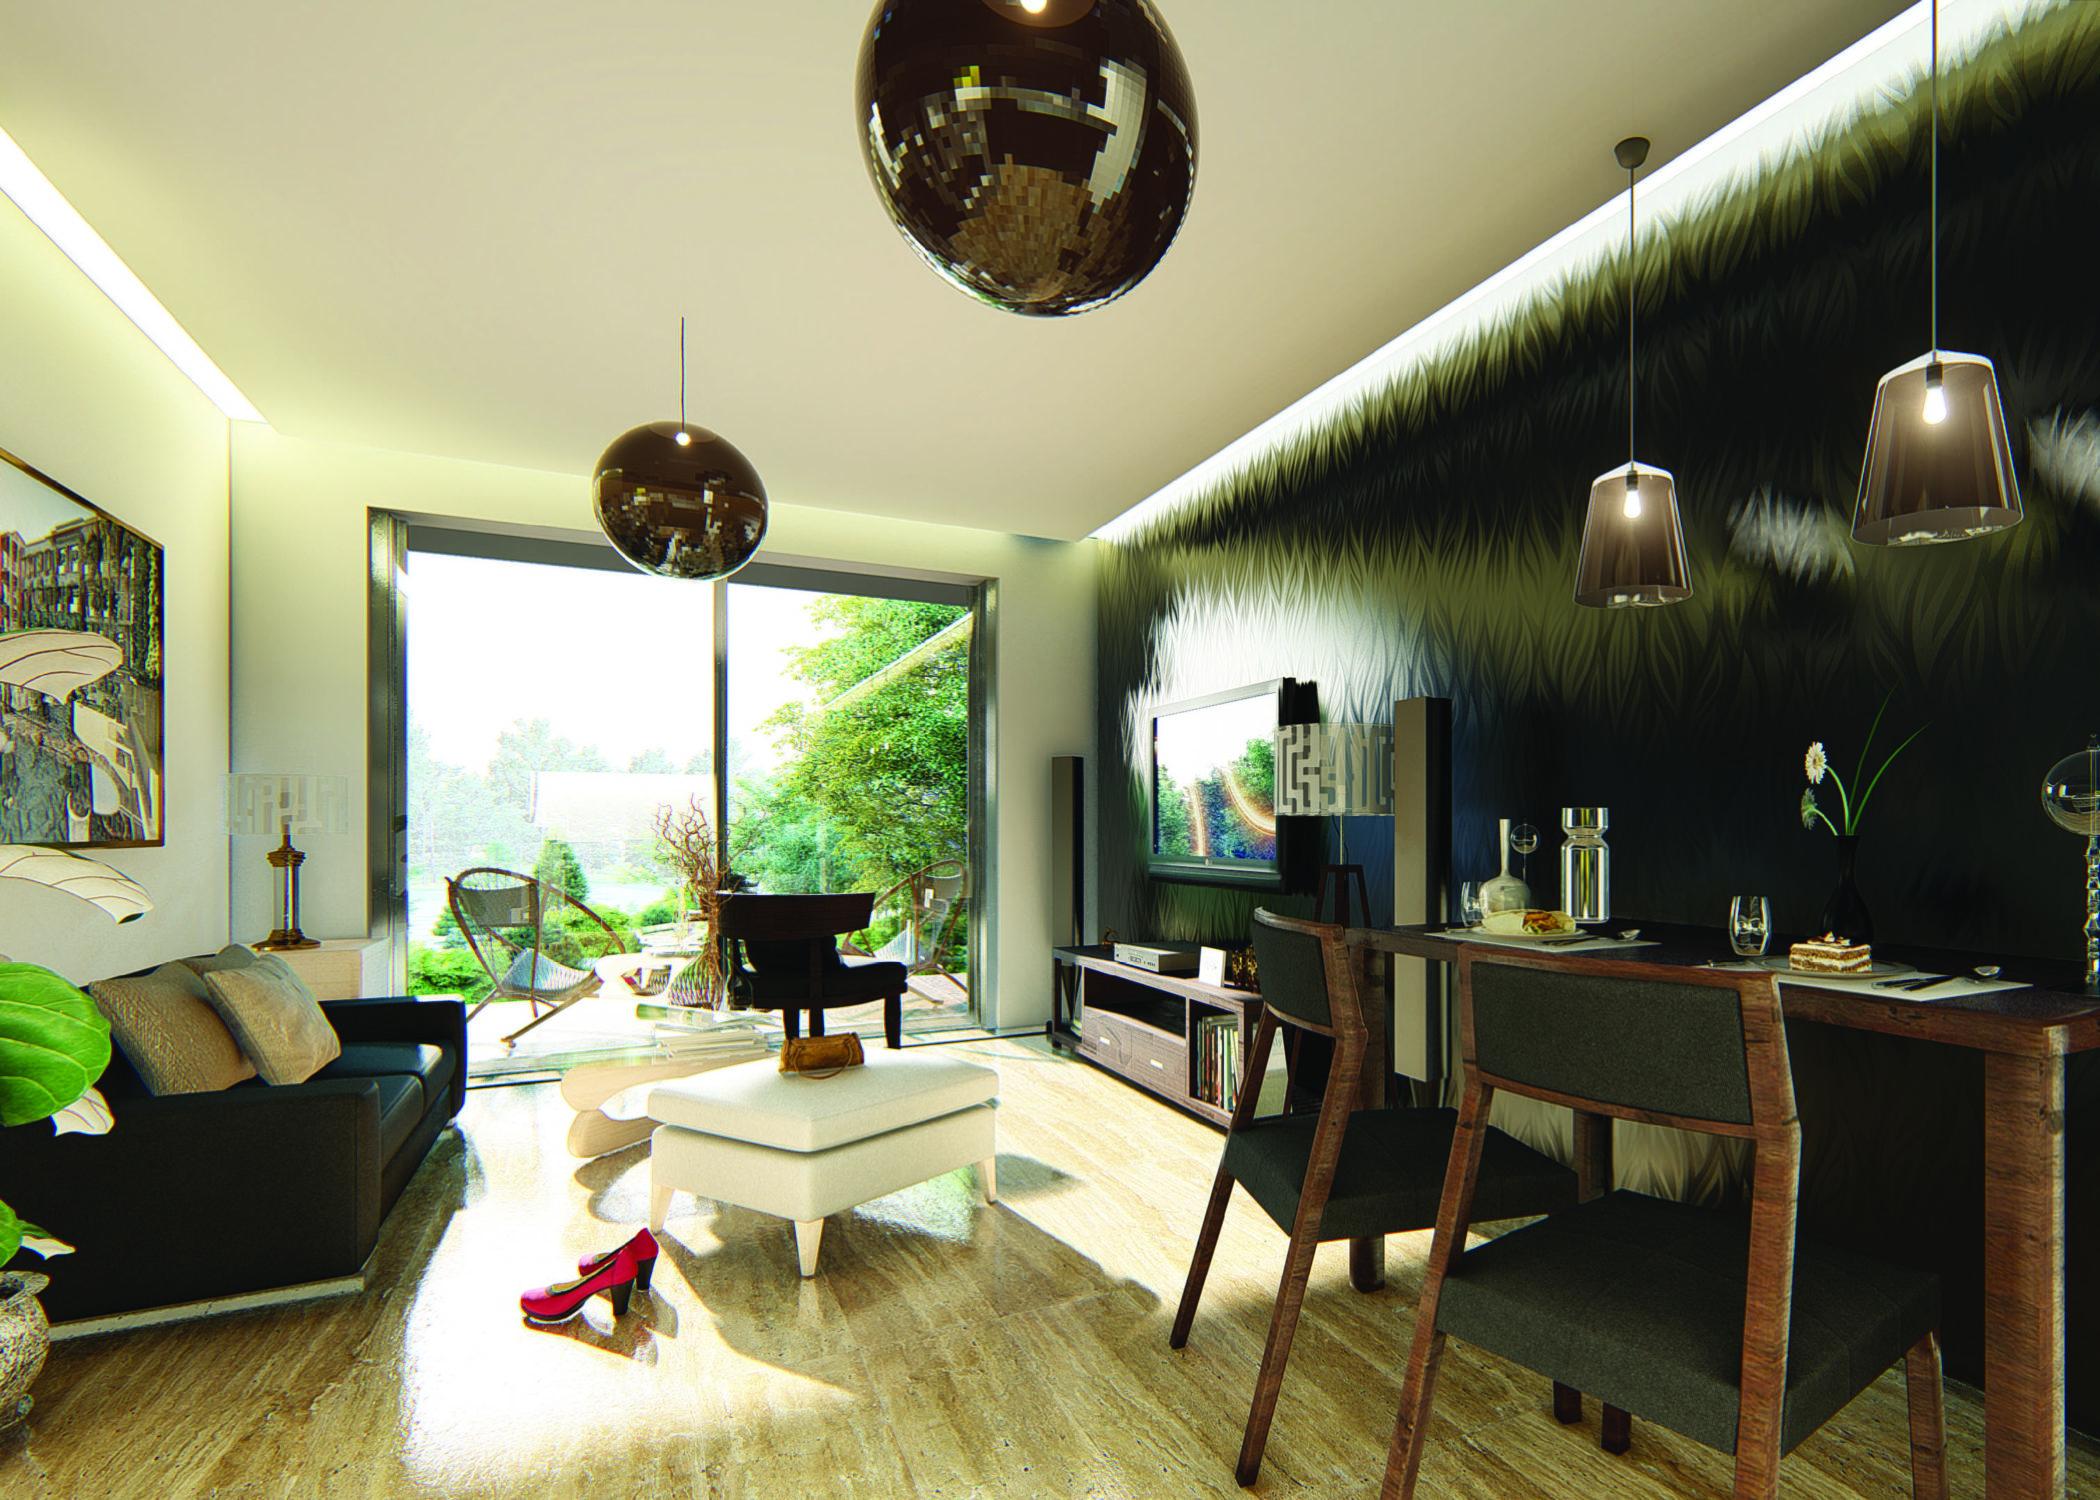 Samana Greens by Samana at Arjan. Luxury apartments for Sale in Dubai_33